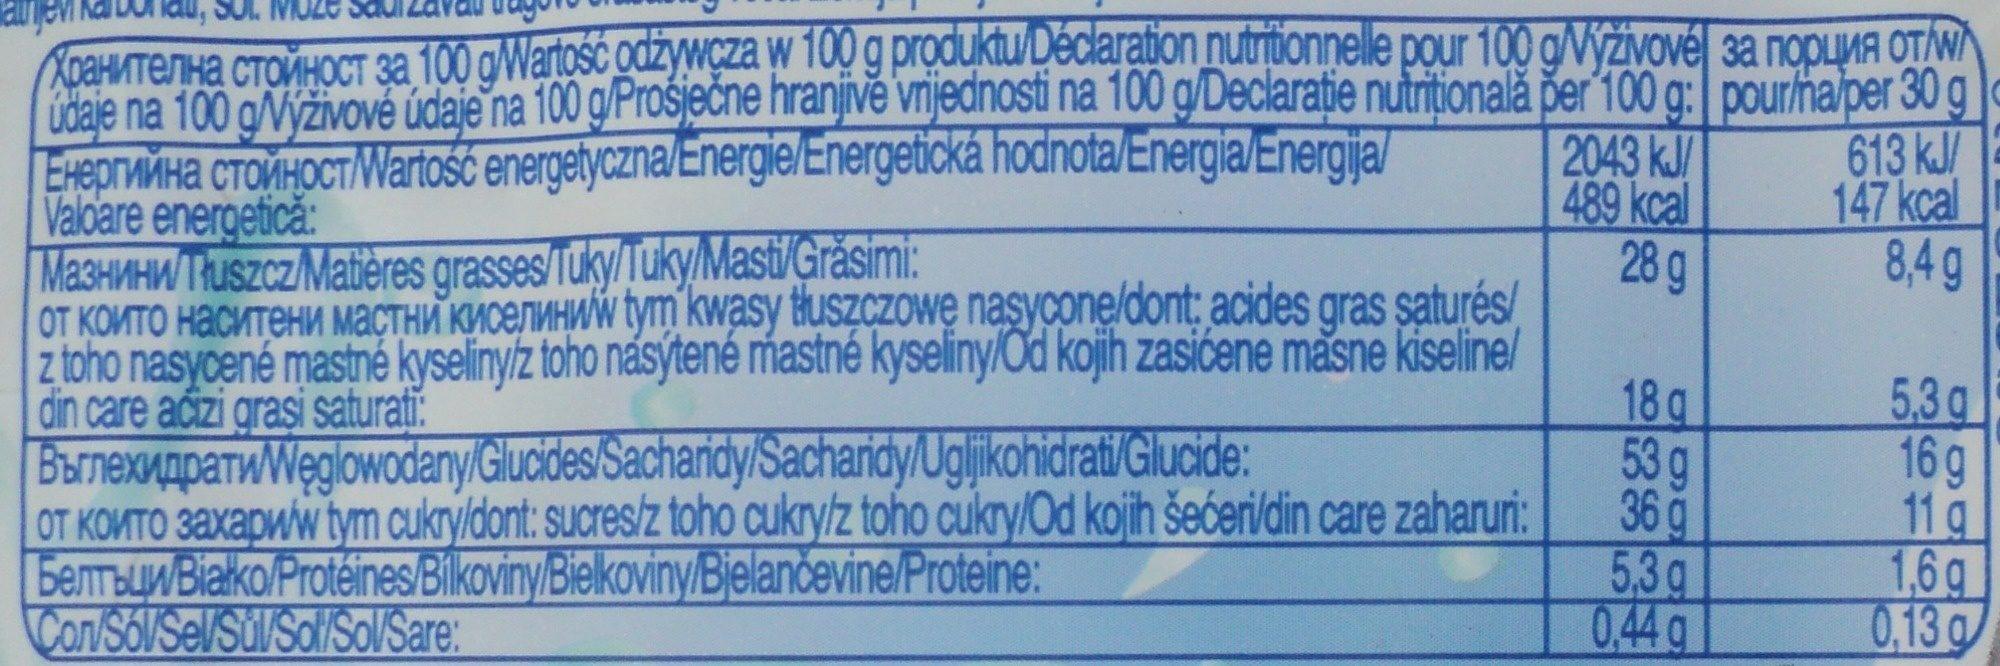 Milino Baton pufos cu umplutura cremoasa de lapte si glazura de cacao - Informations nutritionnelles